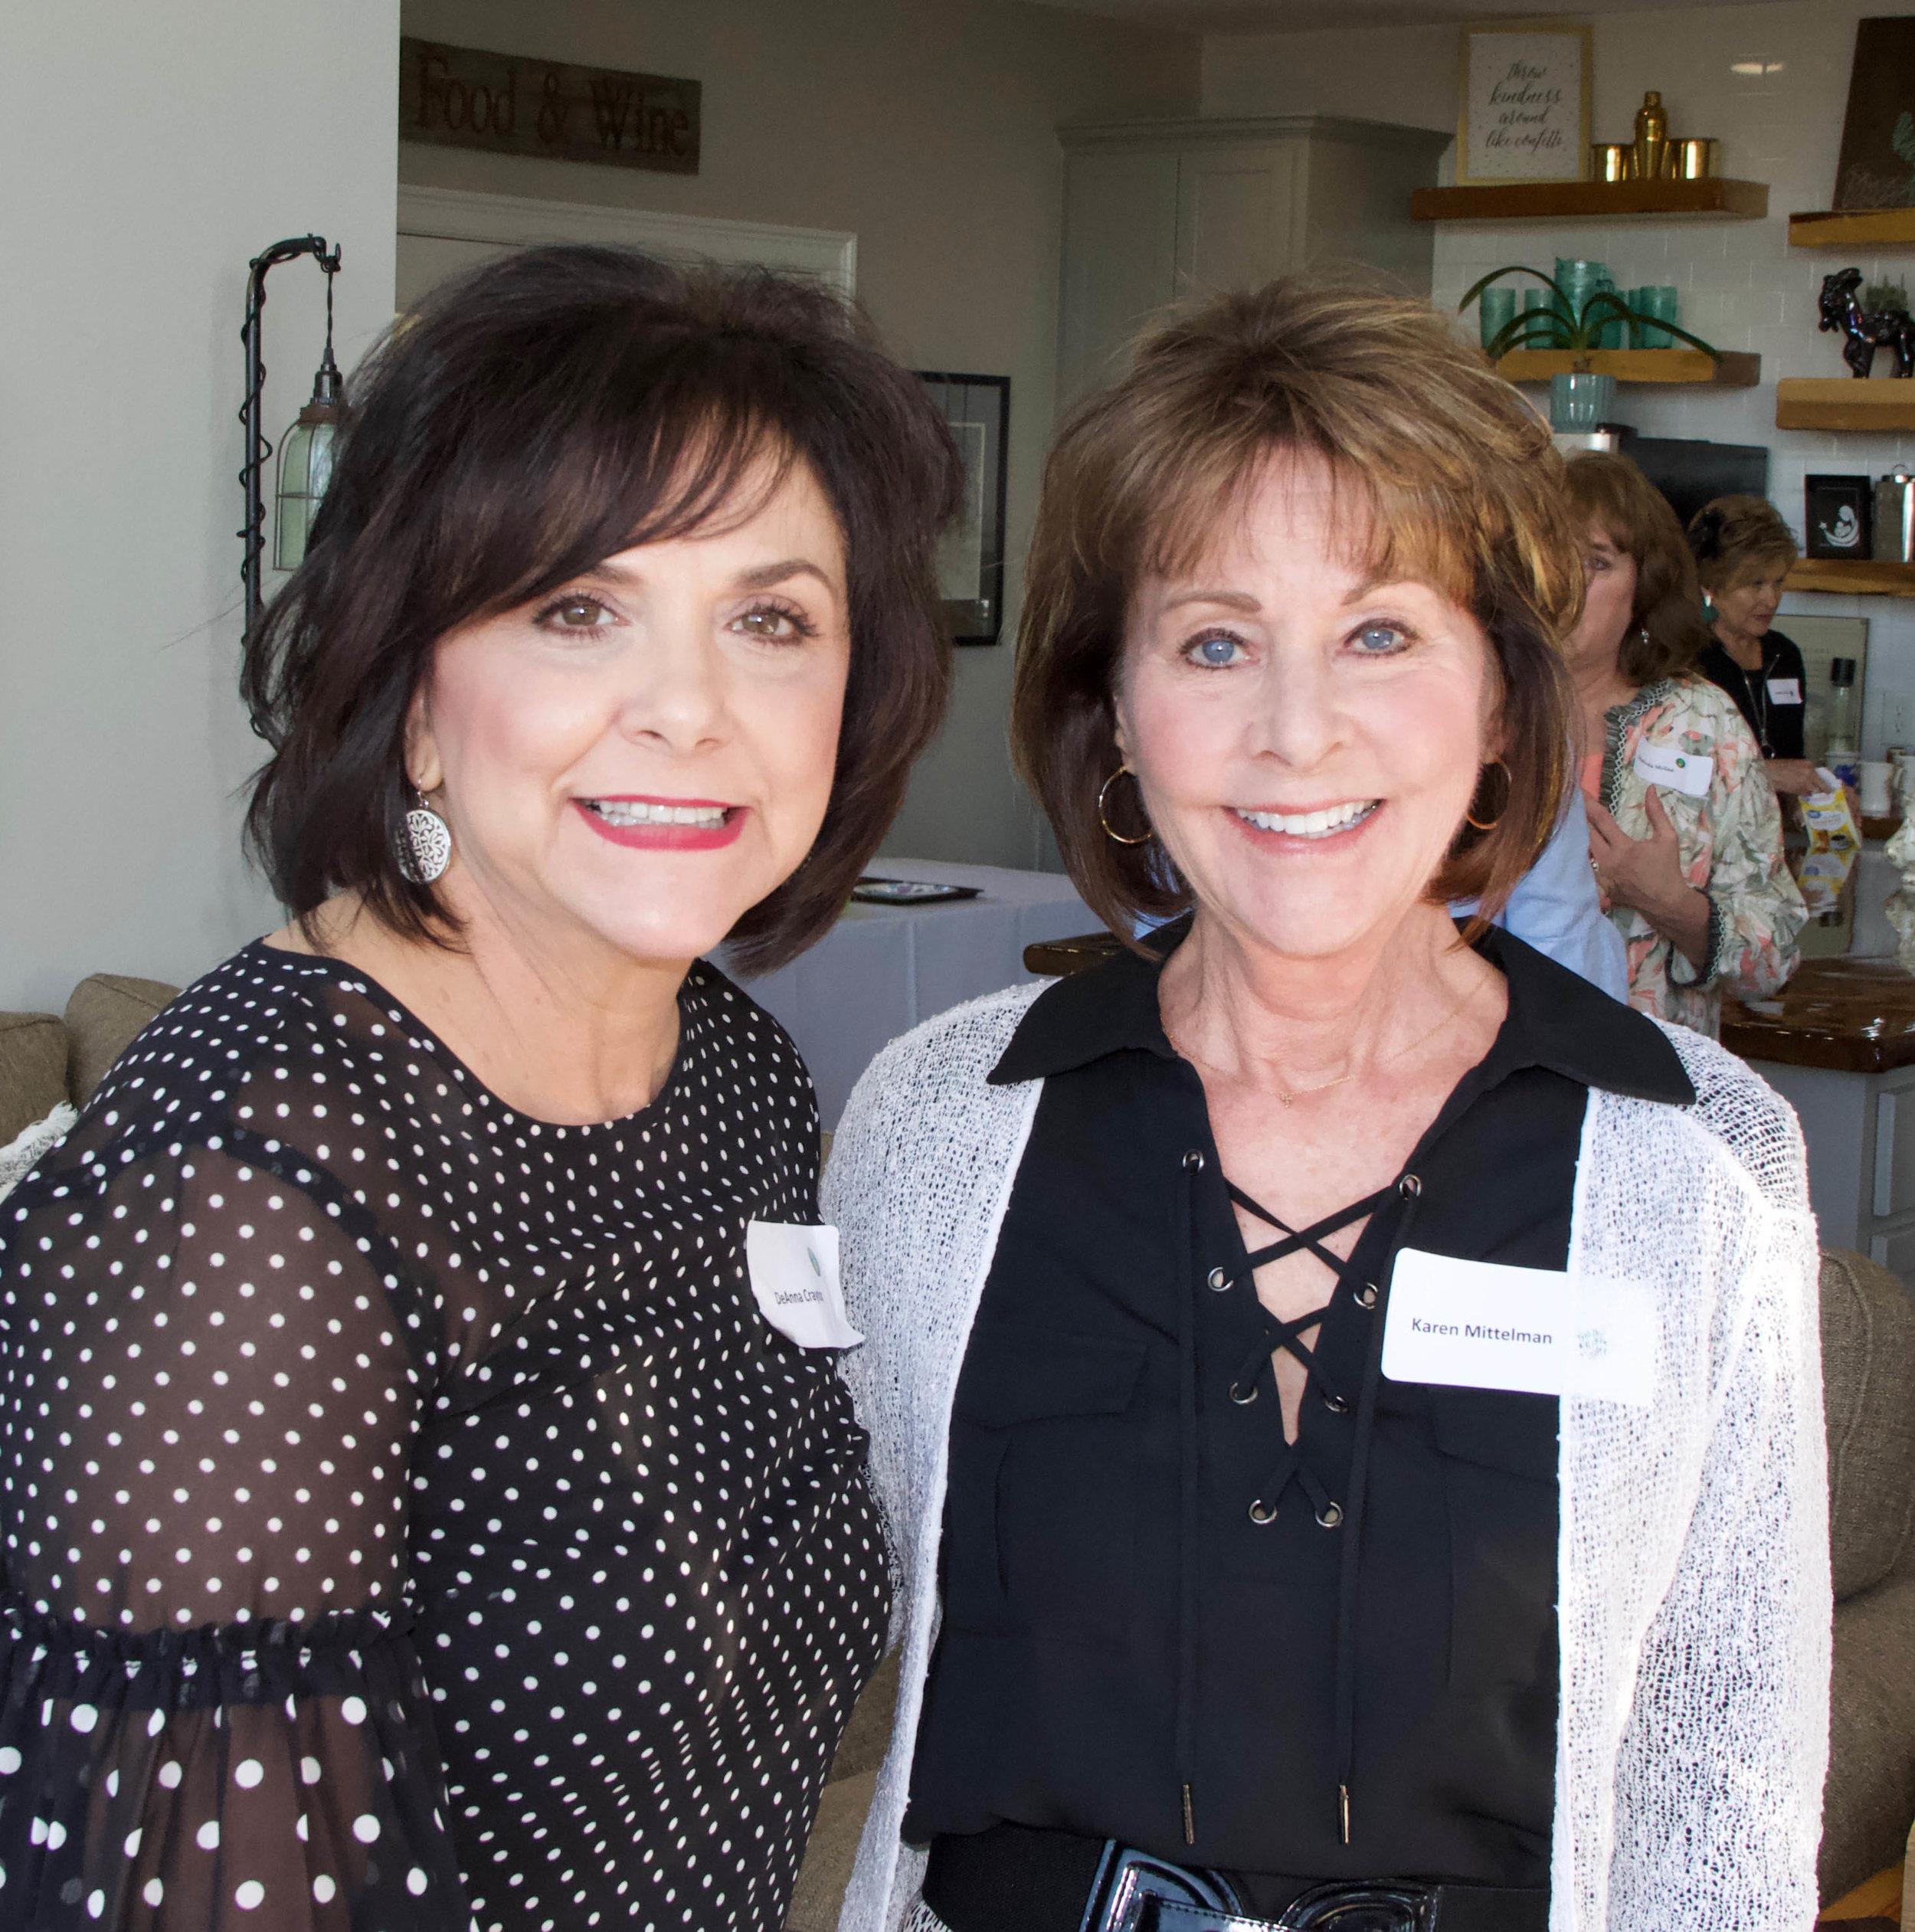 Deanna Craytor and Karen Mittelman